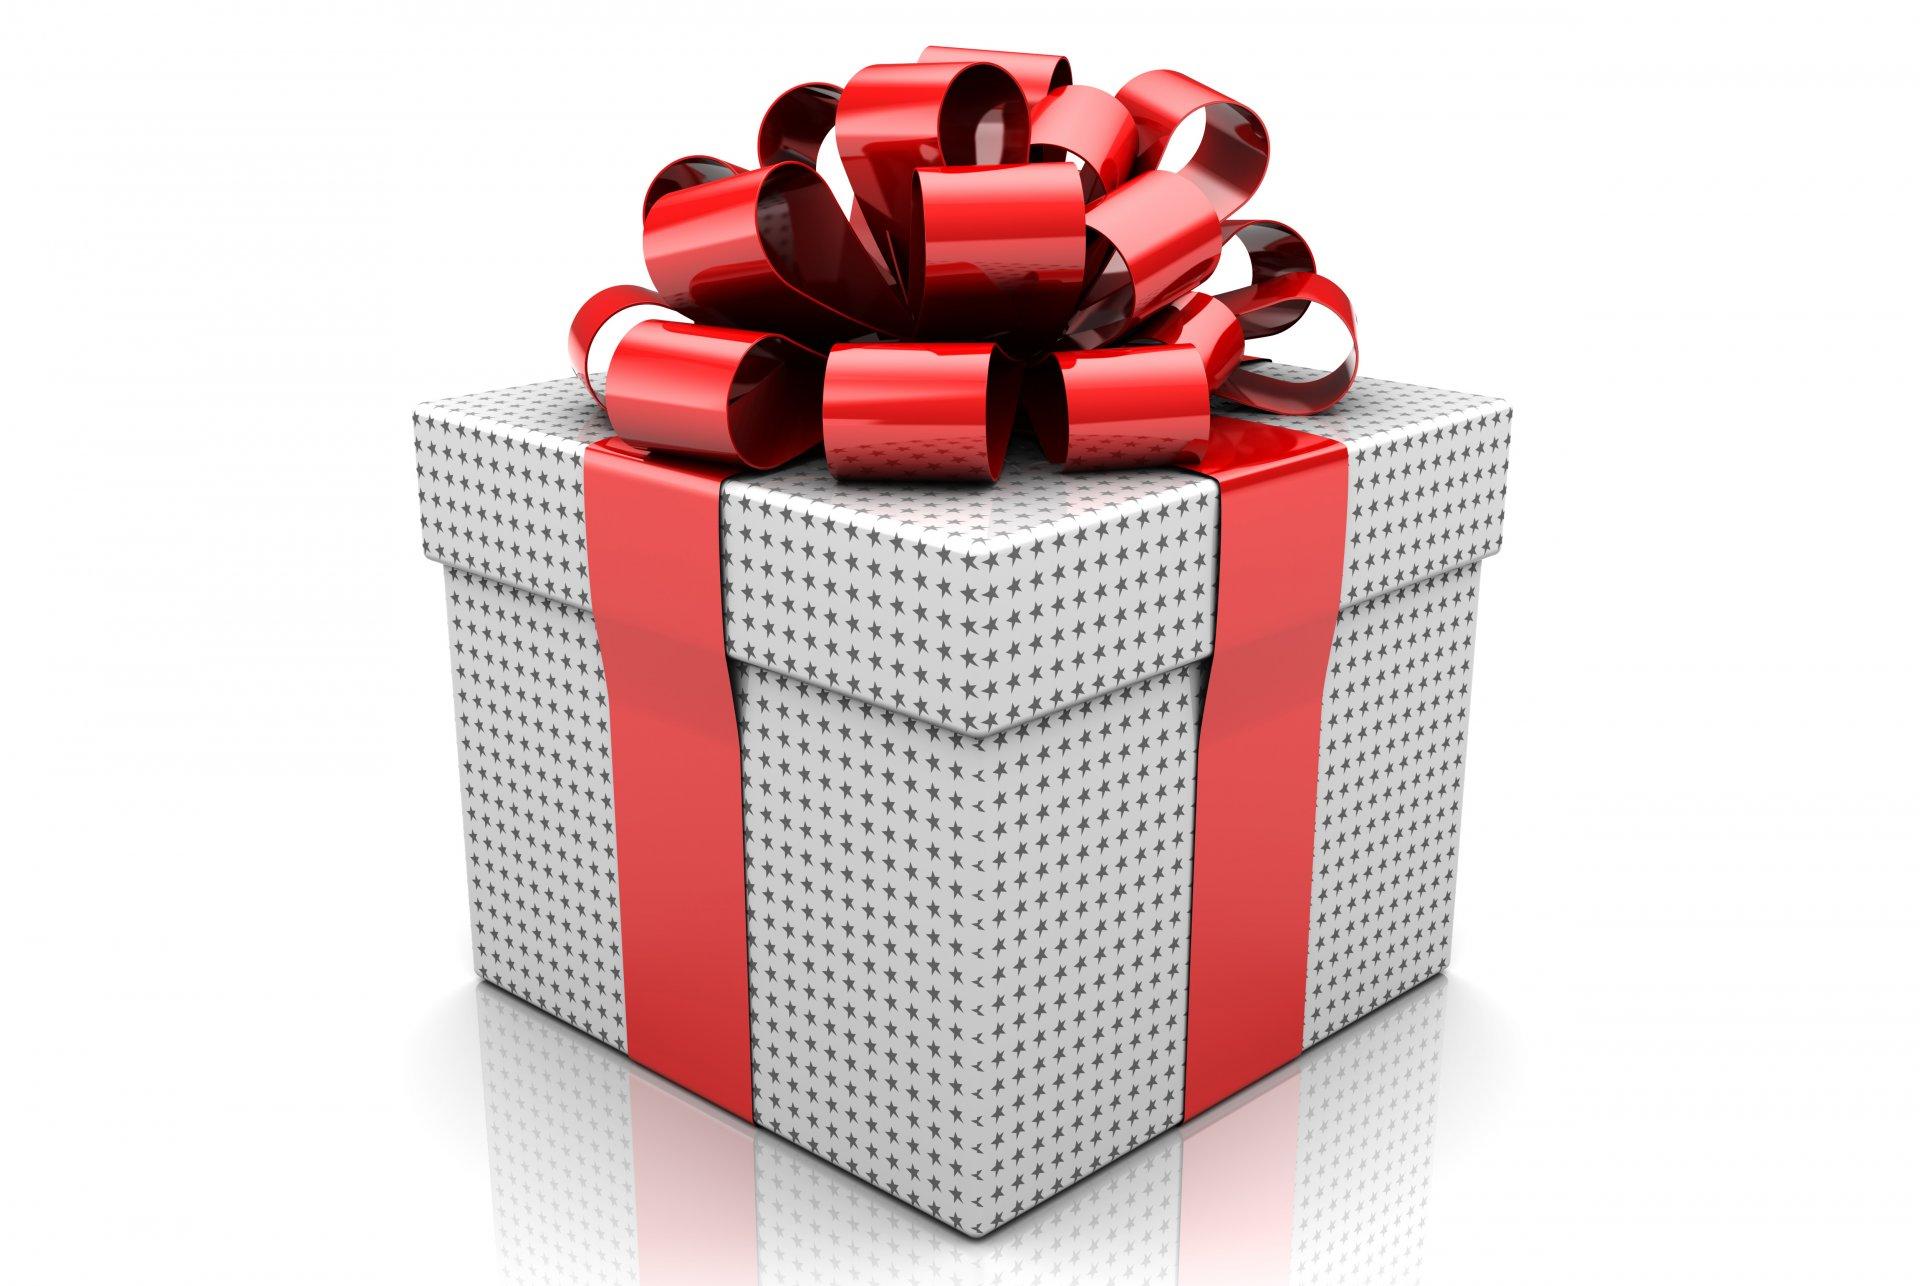 Картинки коробочка с подарком, картинка